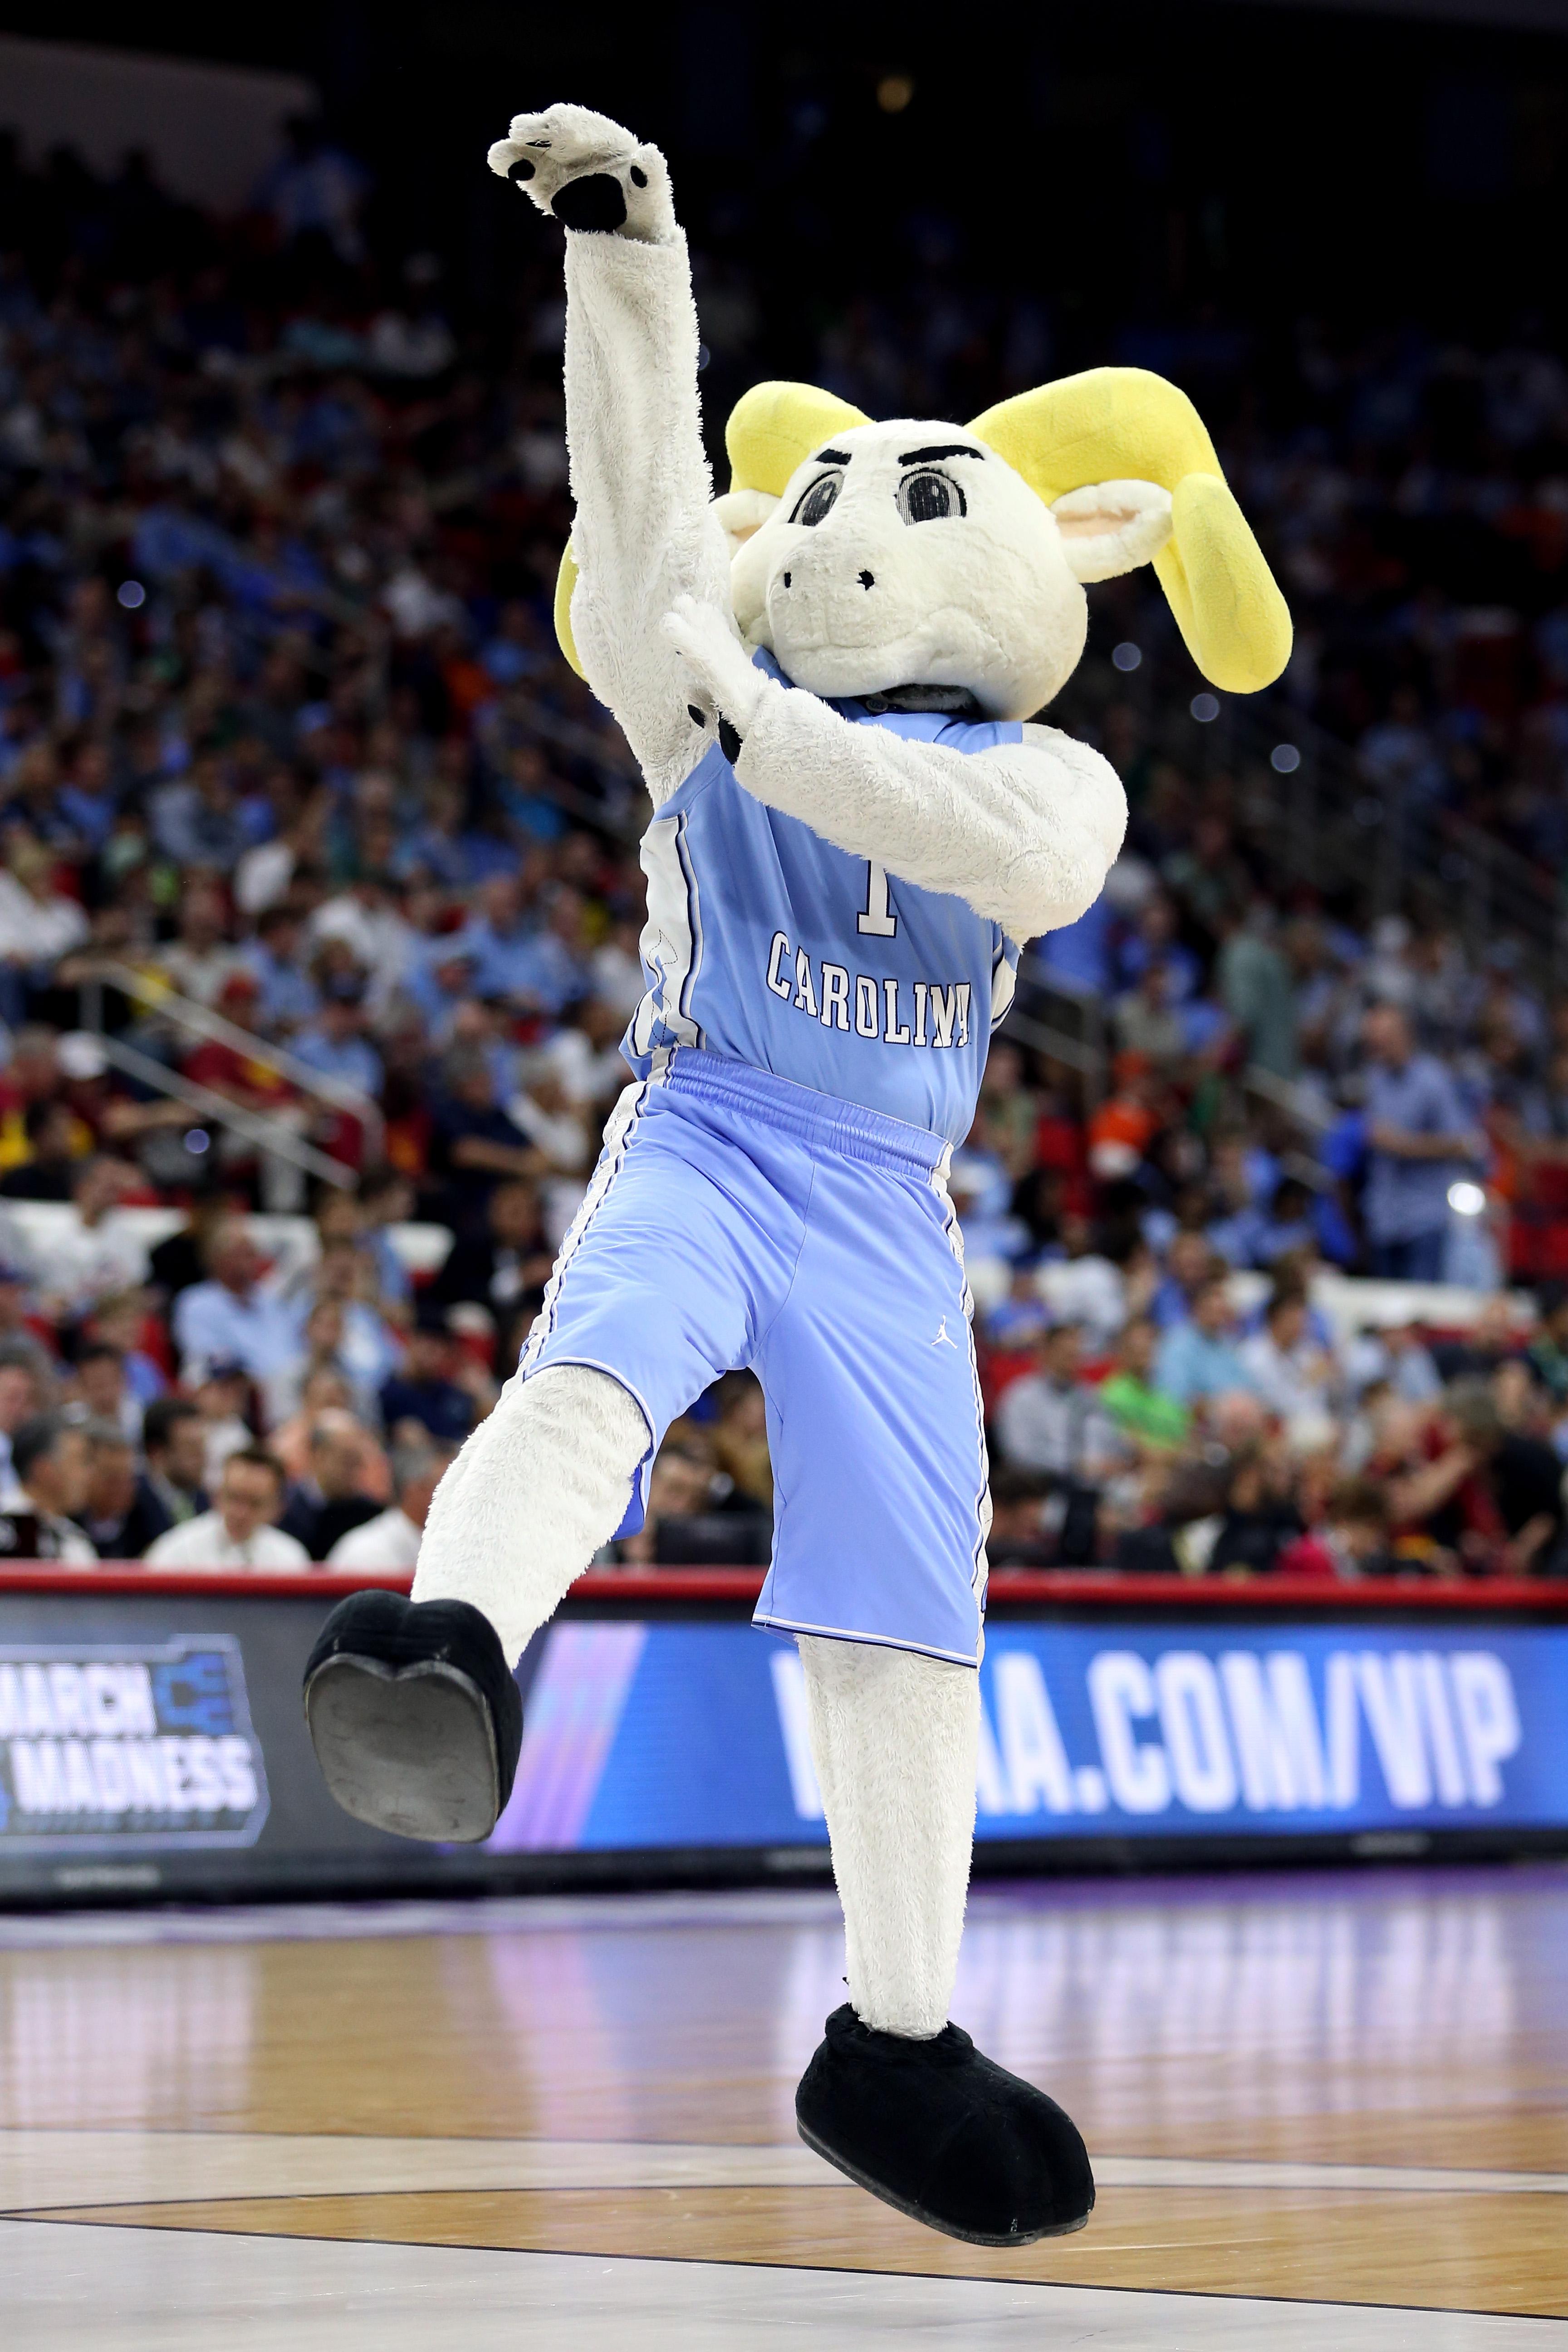 NCAA Basketball Tournament - First Round - Florida Gulf Coast v North Carolina